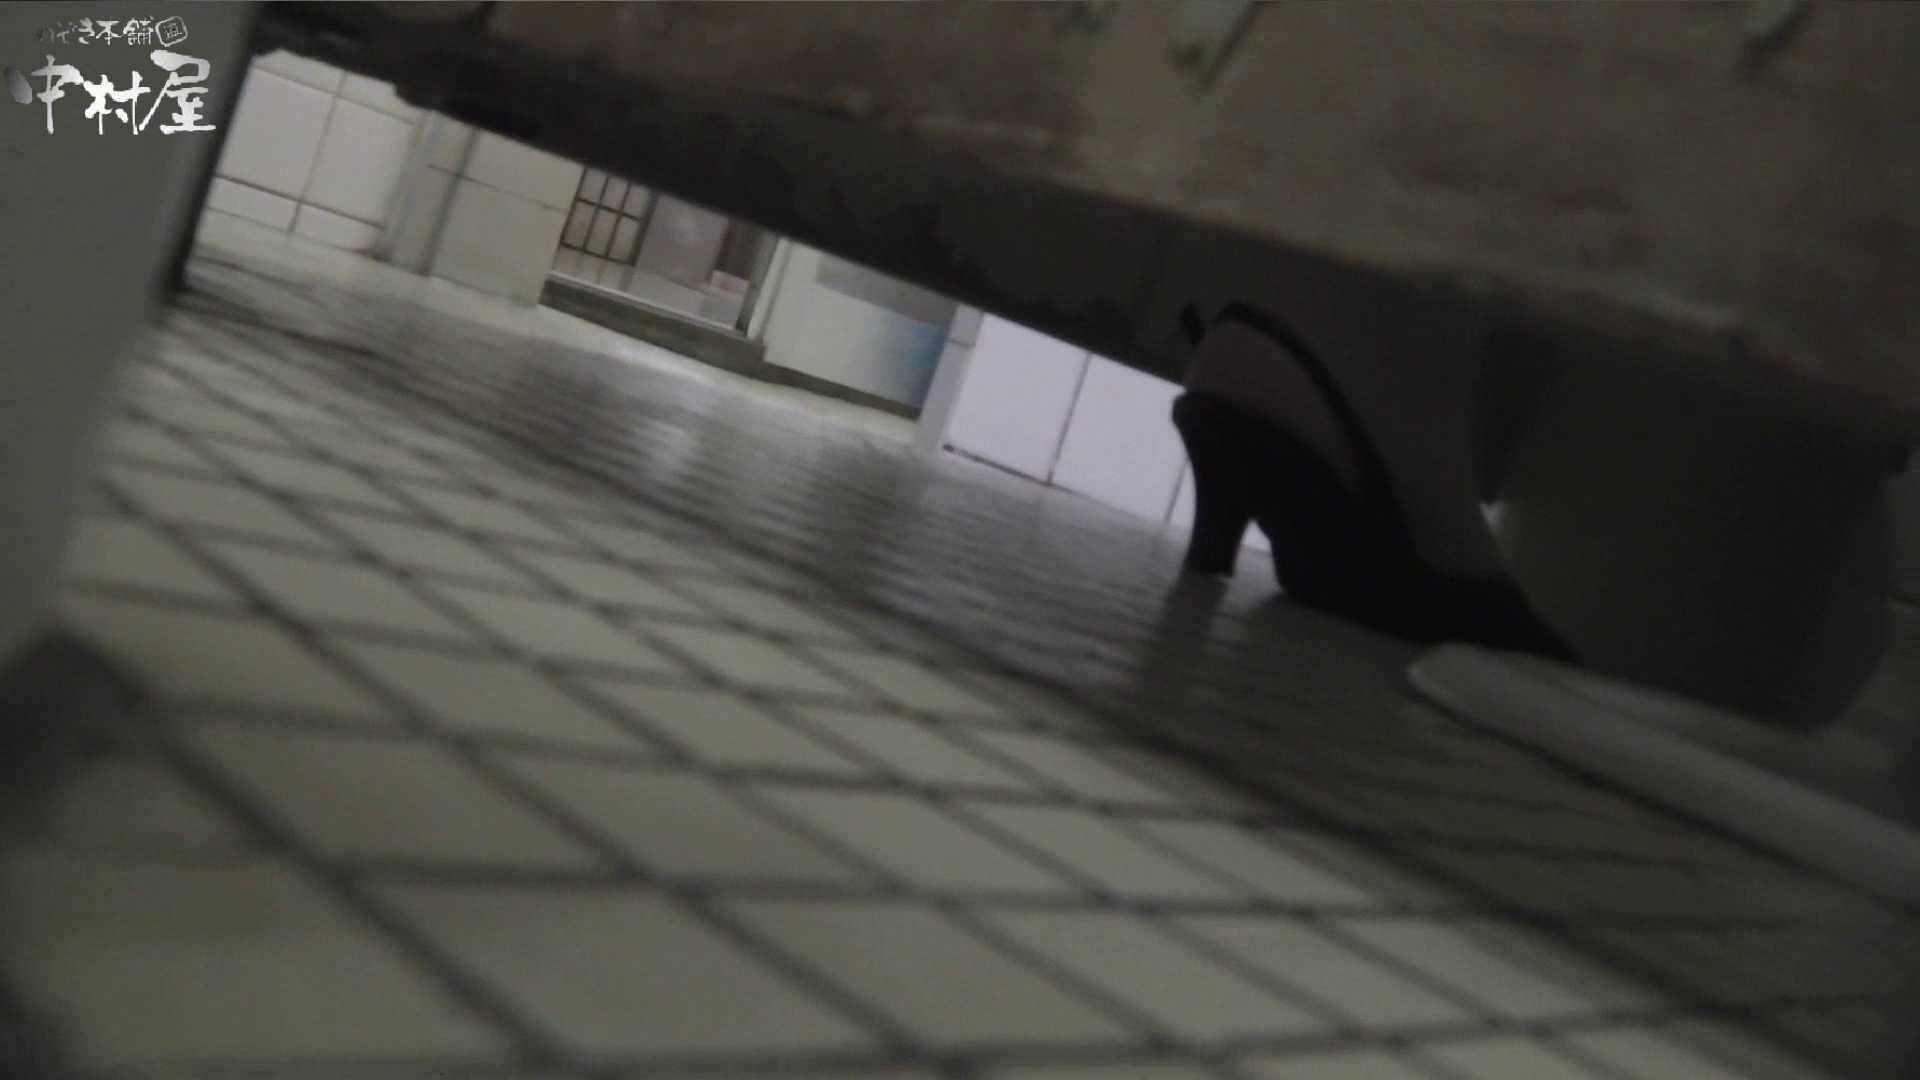 vol.41 命がけ潜伏洗面所! 毛薄め・硬度並・推定250g プライベート 盗撮画像 54連発 9